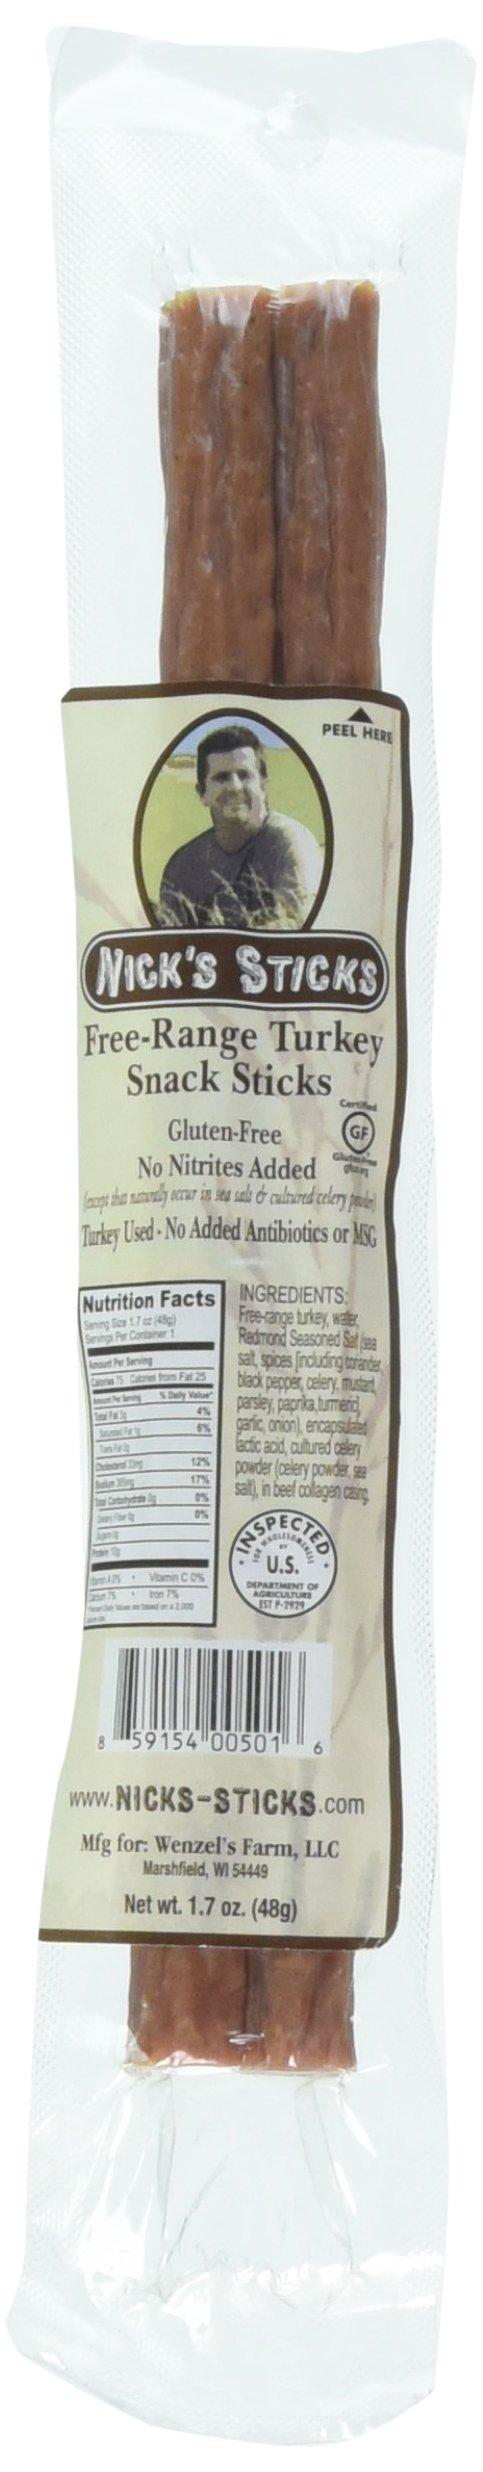 Nick's Sticks Free Range Turkey Snack Sticks - Gluten Free – Paleo, Keto, Whole30 Approved – No Sugar, Soy, Antibiotics or Hormones (6 – 1.7oz. Packages of 2 Sticks)